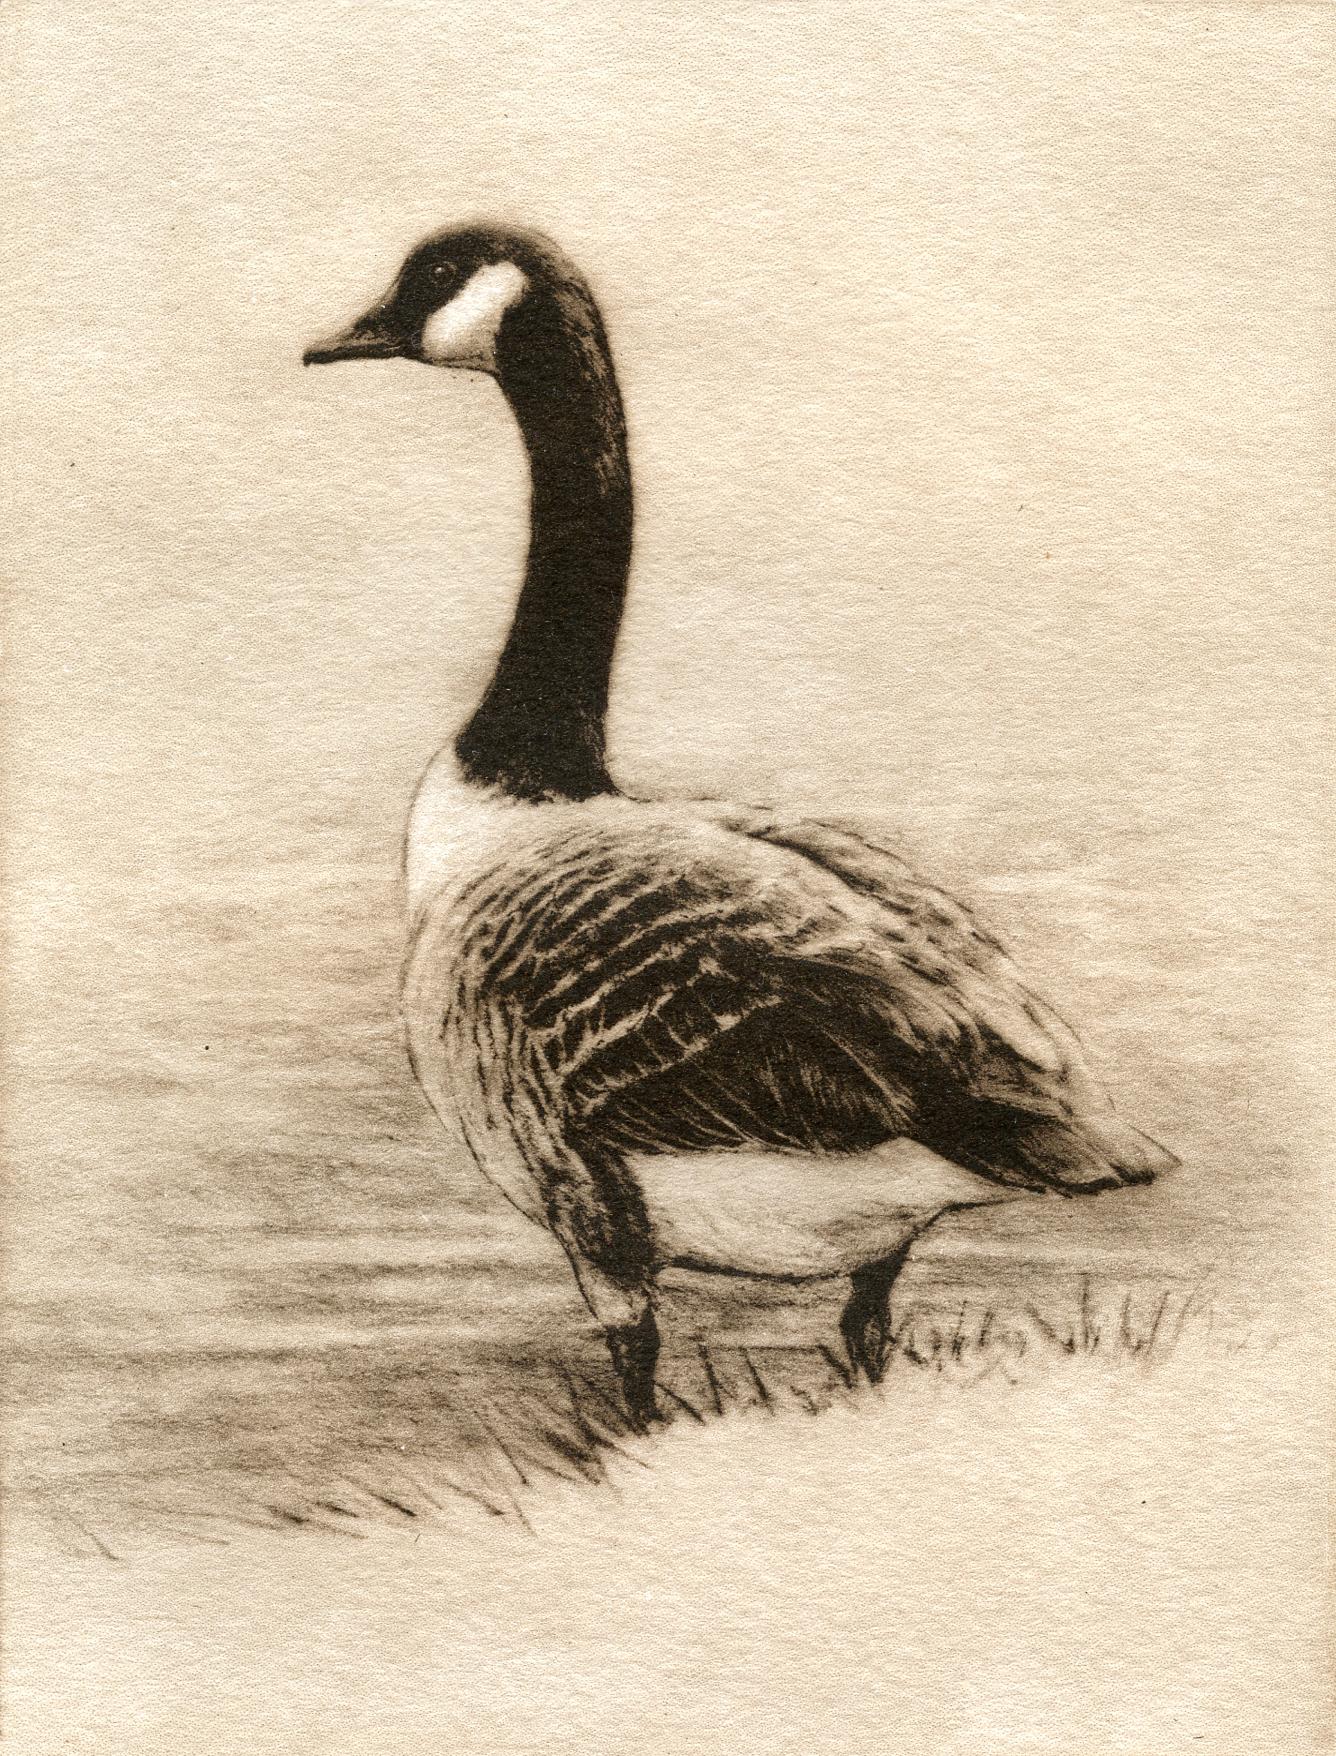 Canada Goose-Fain, watercolor/etching $325